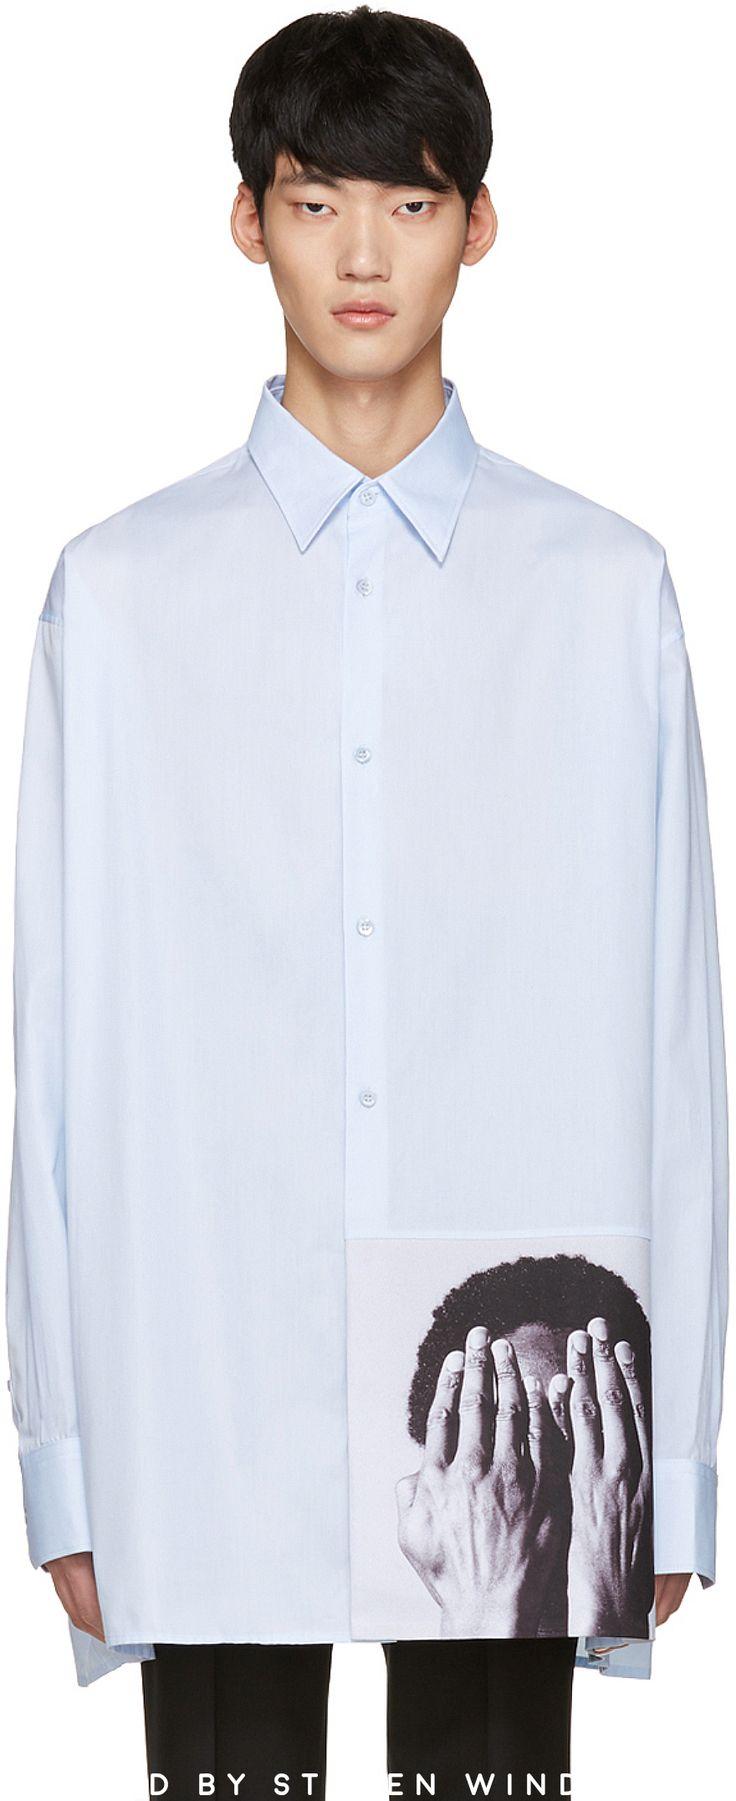 Raf Simons - Blue Robert Mapplethorpe Edition Alistair Oversized Shirt #shirts #rafsimons